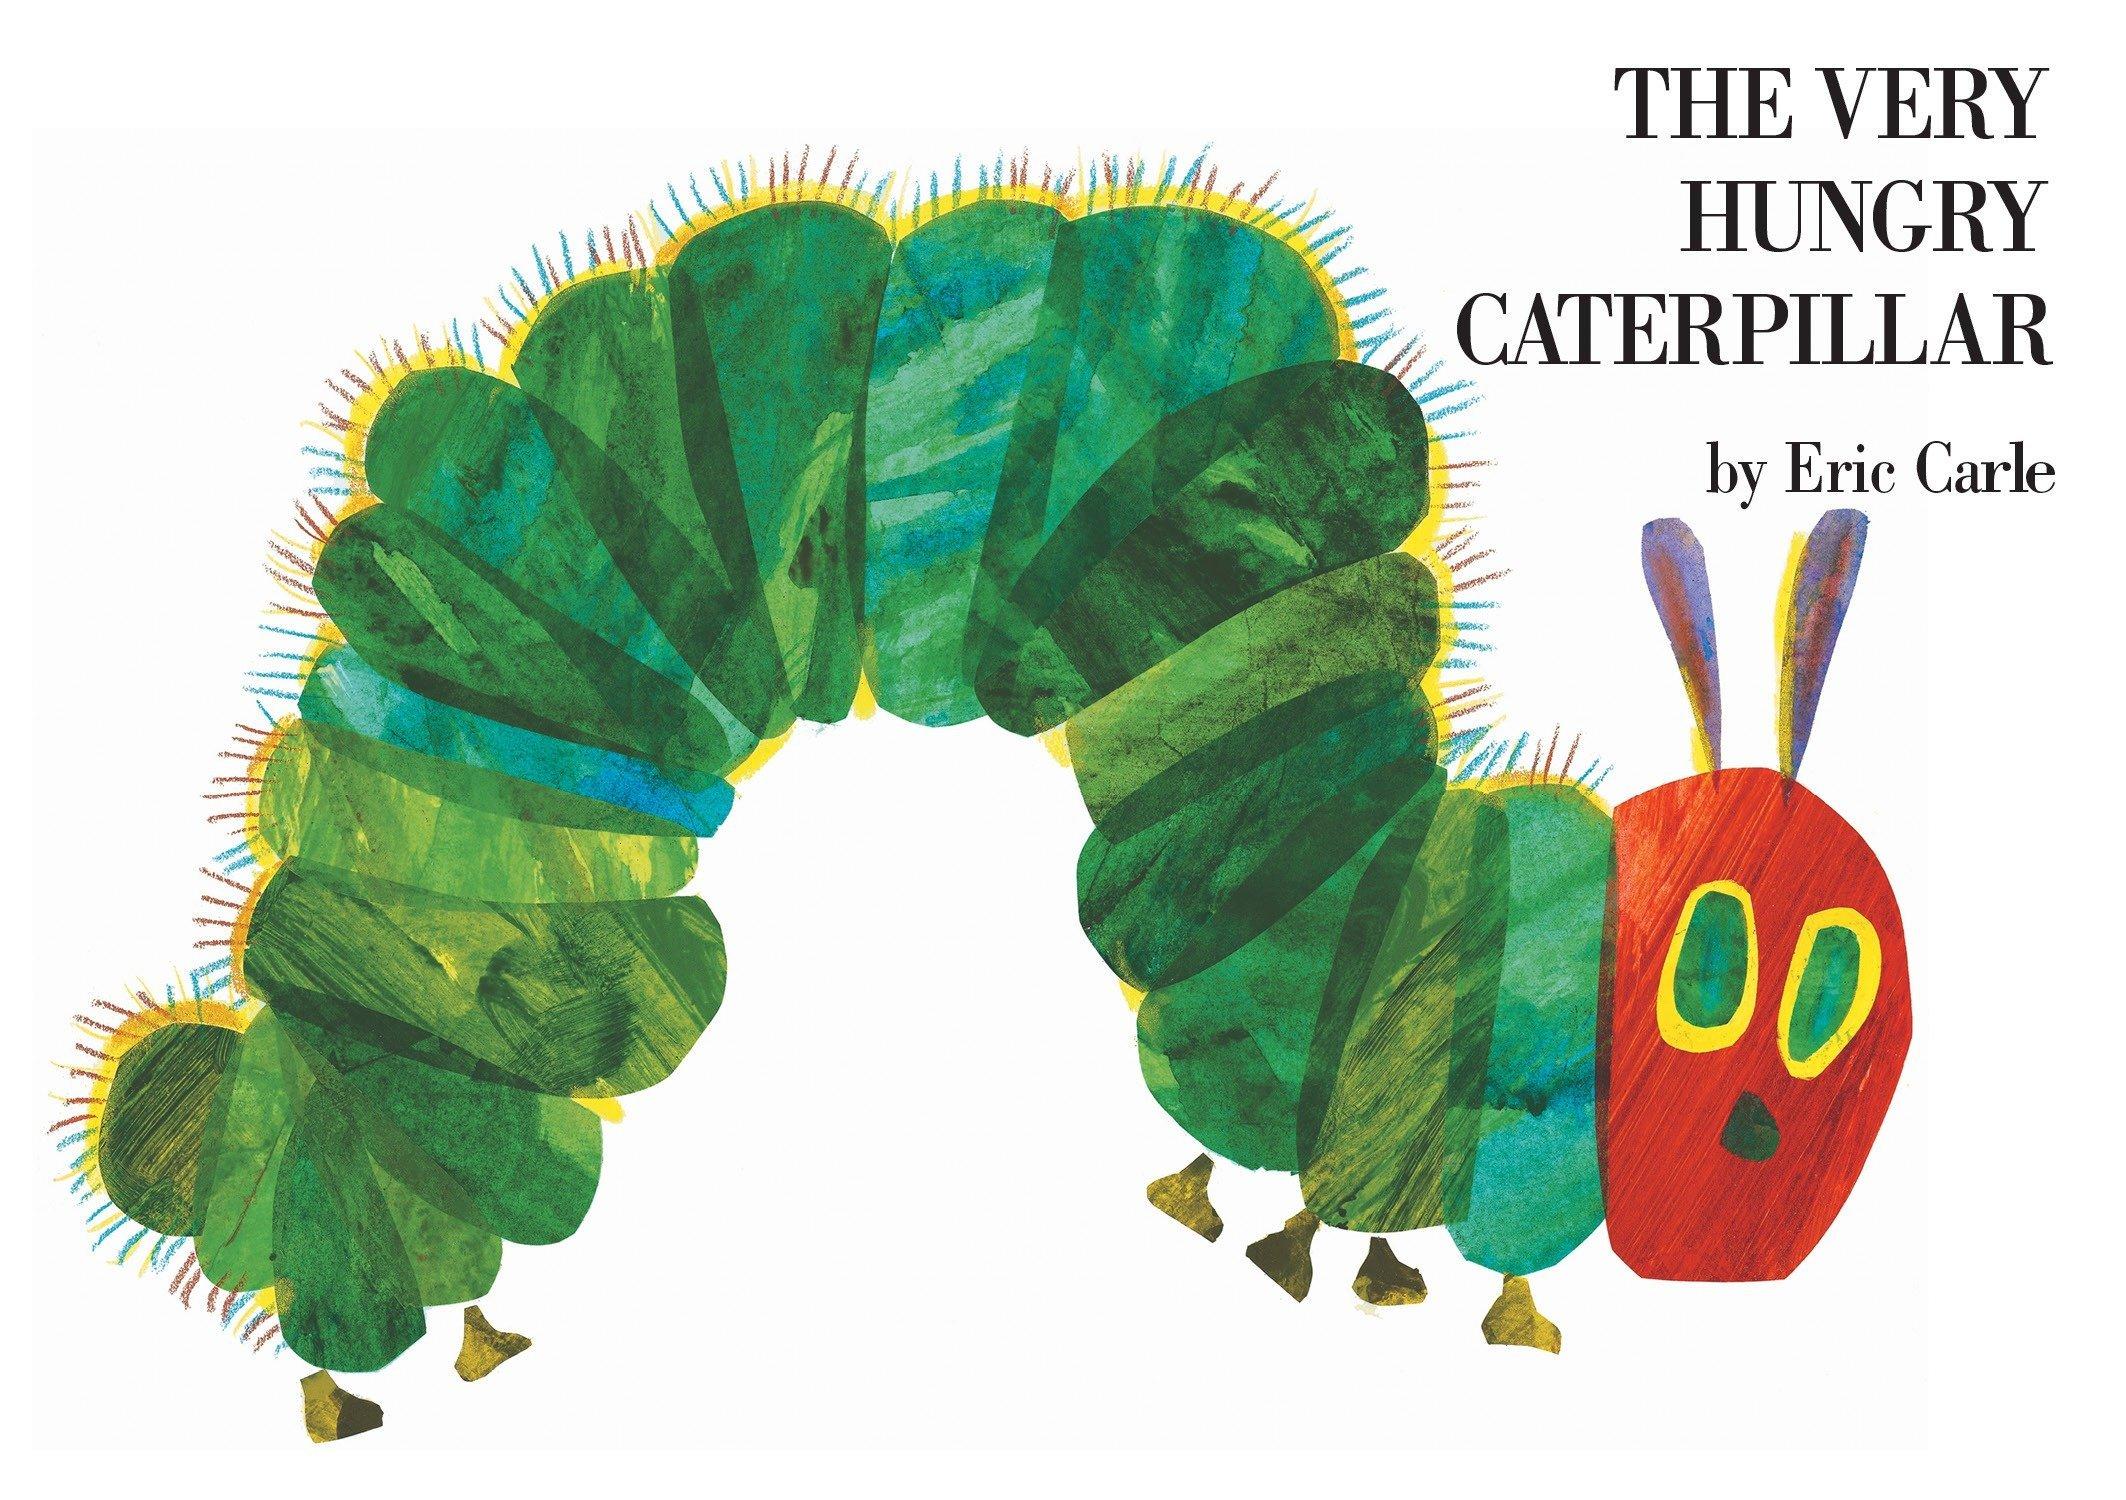 - Amazon.com: The Very Hungry Caterpillar (9780399255564): Carle